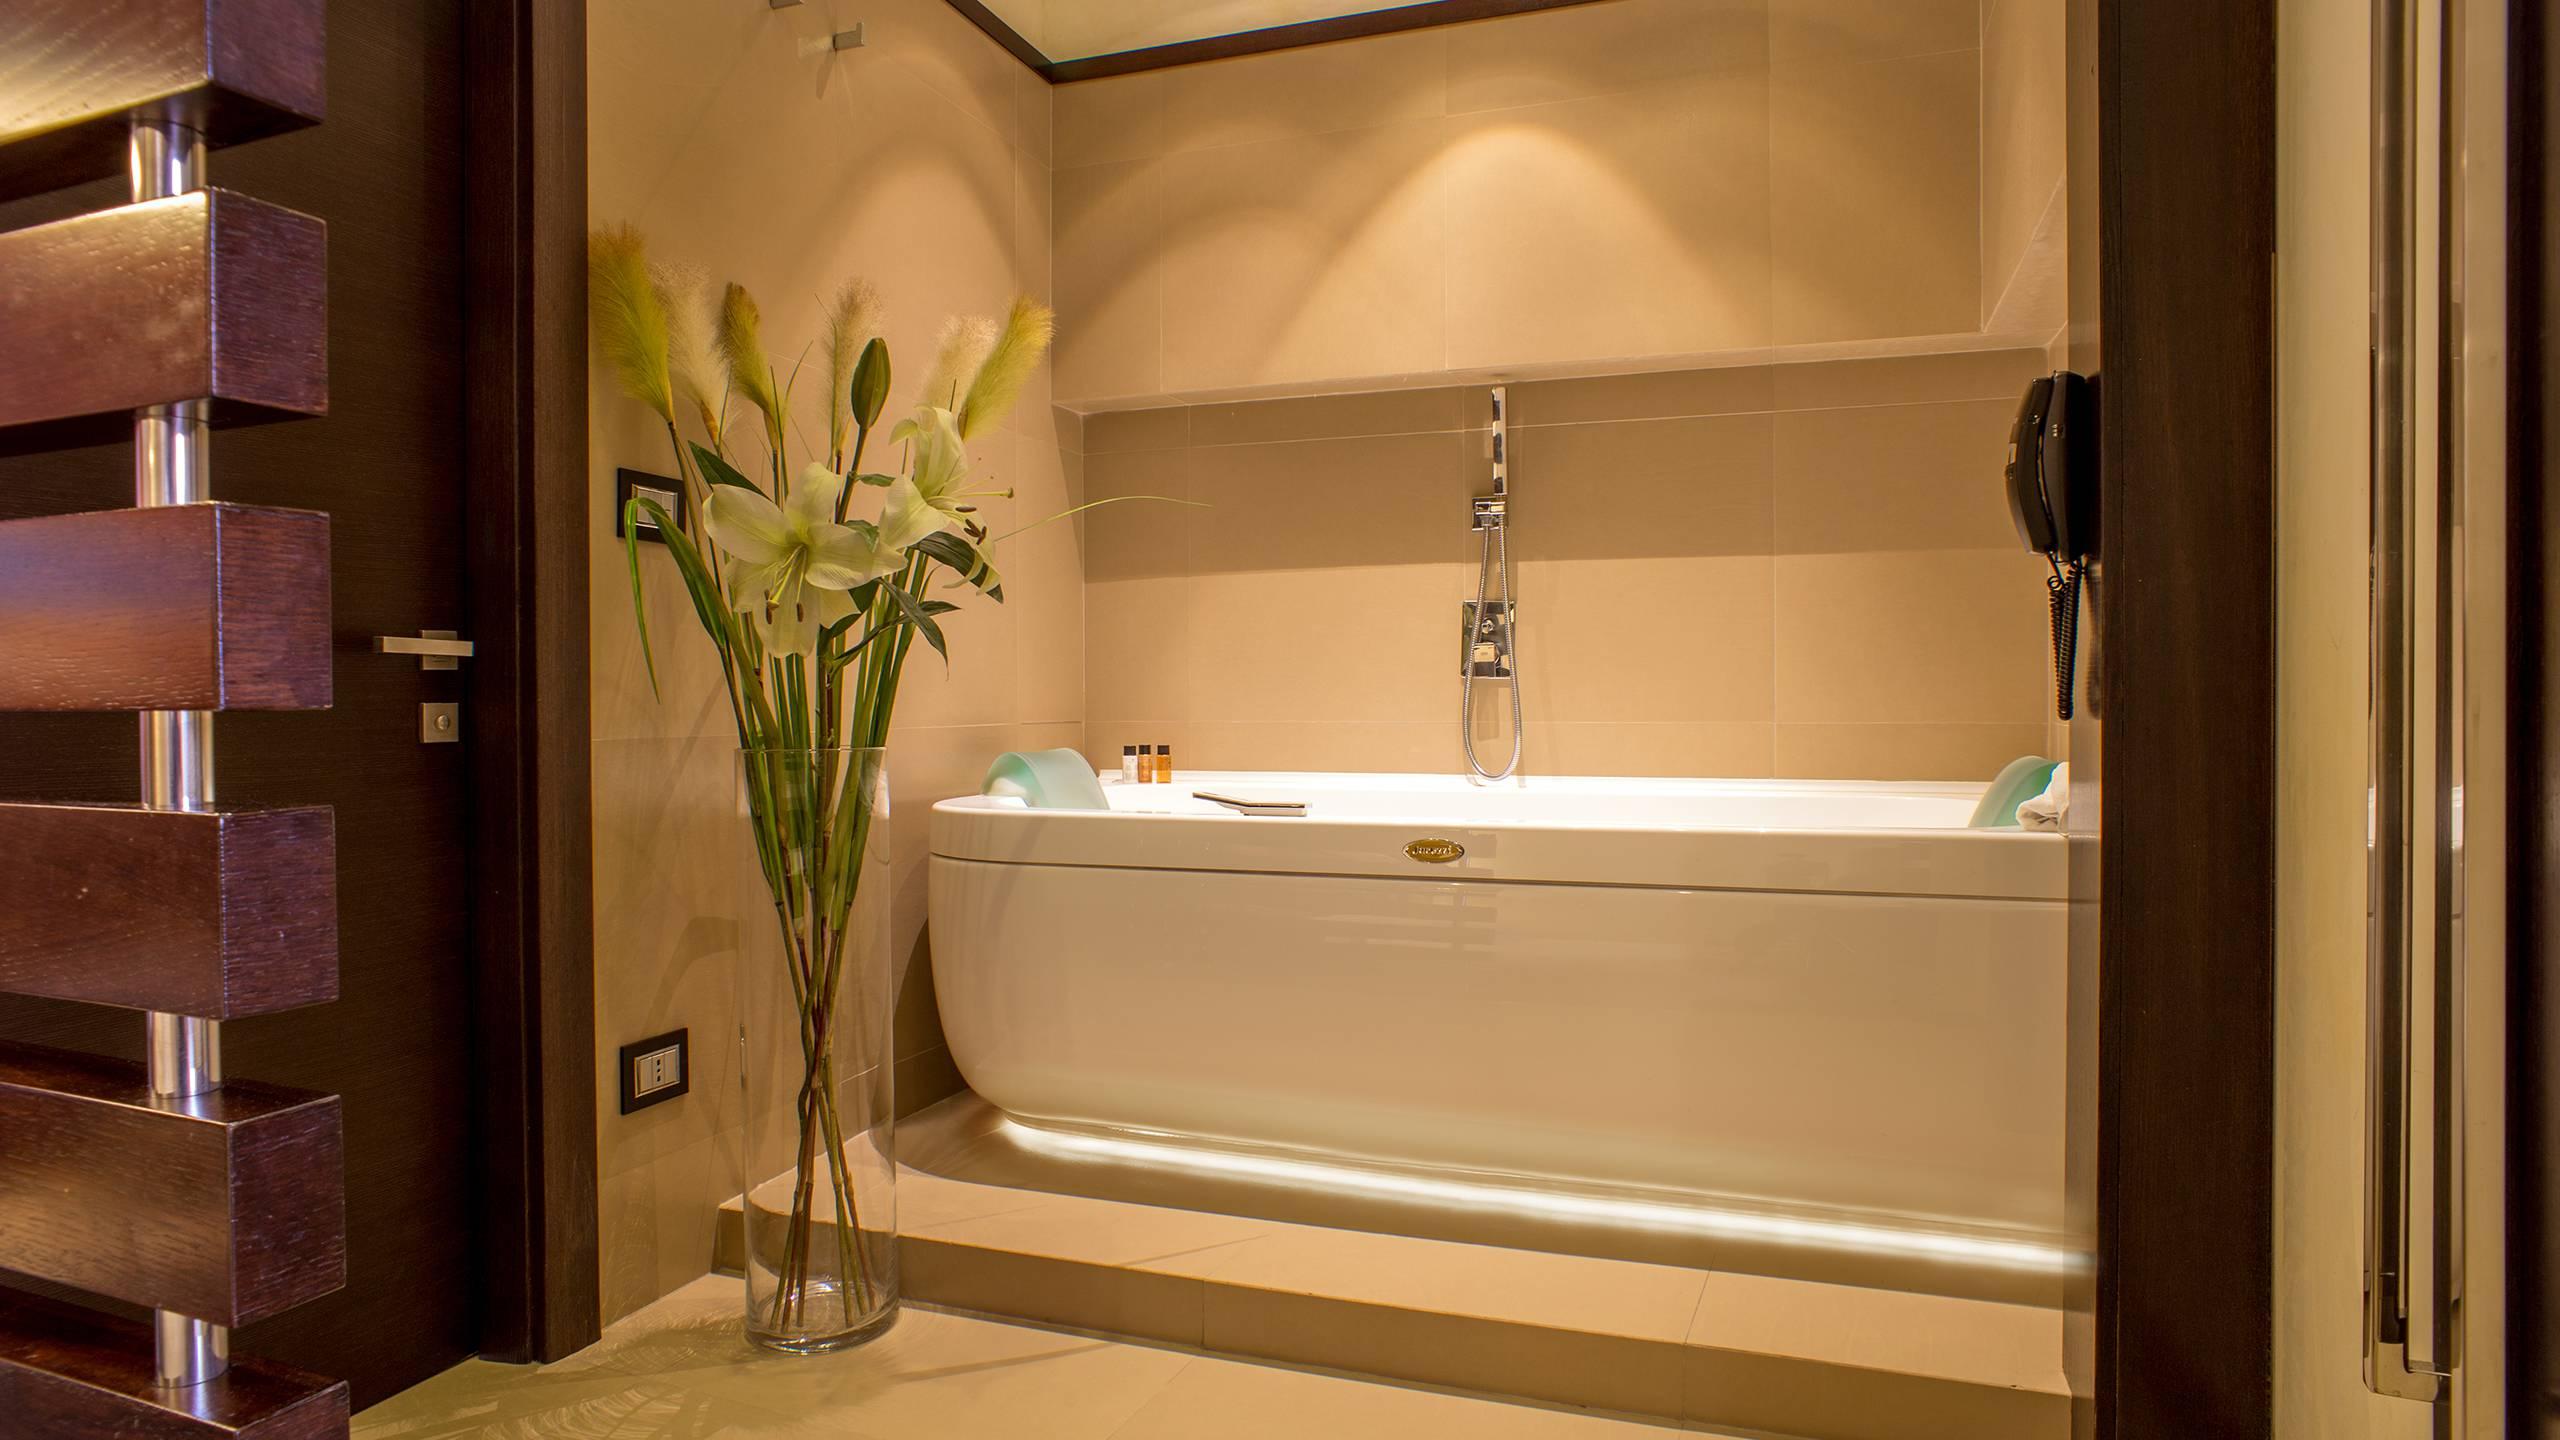 07-Les-Fleurs-Luxury-House-Rome-room